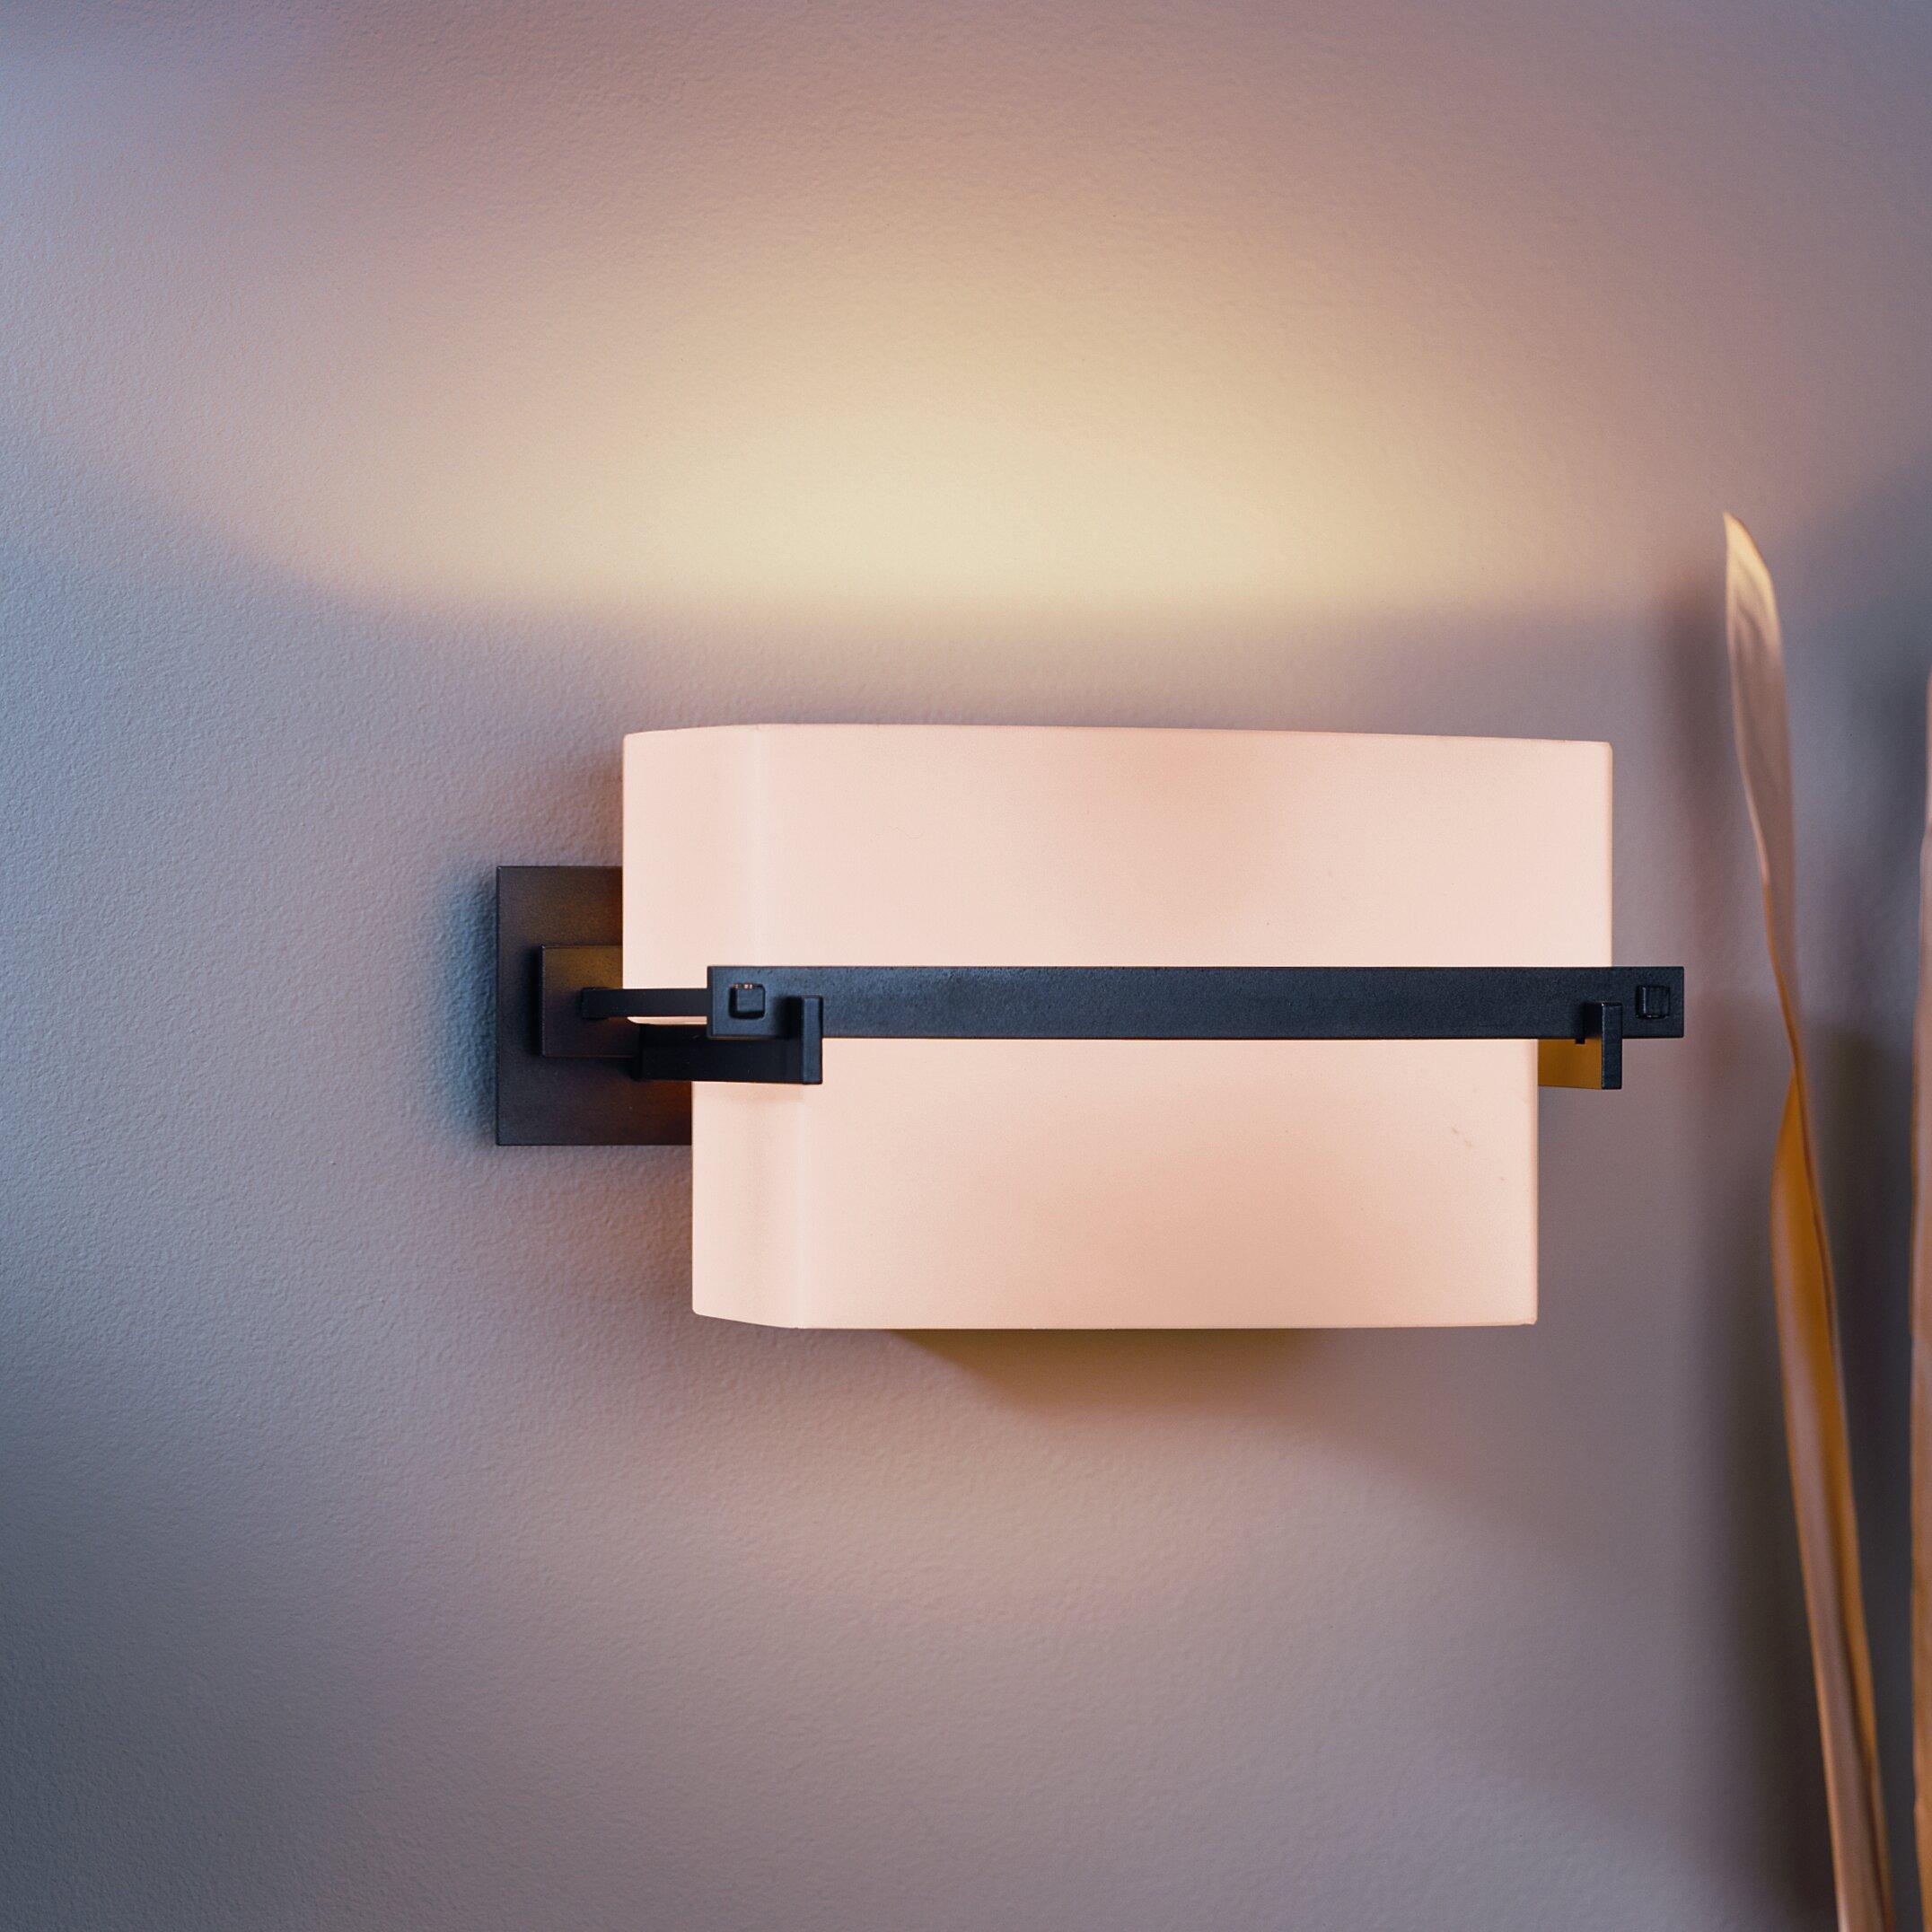 Hubbardton Forge Oculus: Hubbardton Forge Kakomi 1 Light Wall Sconce